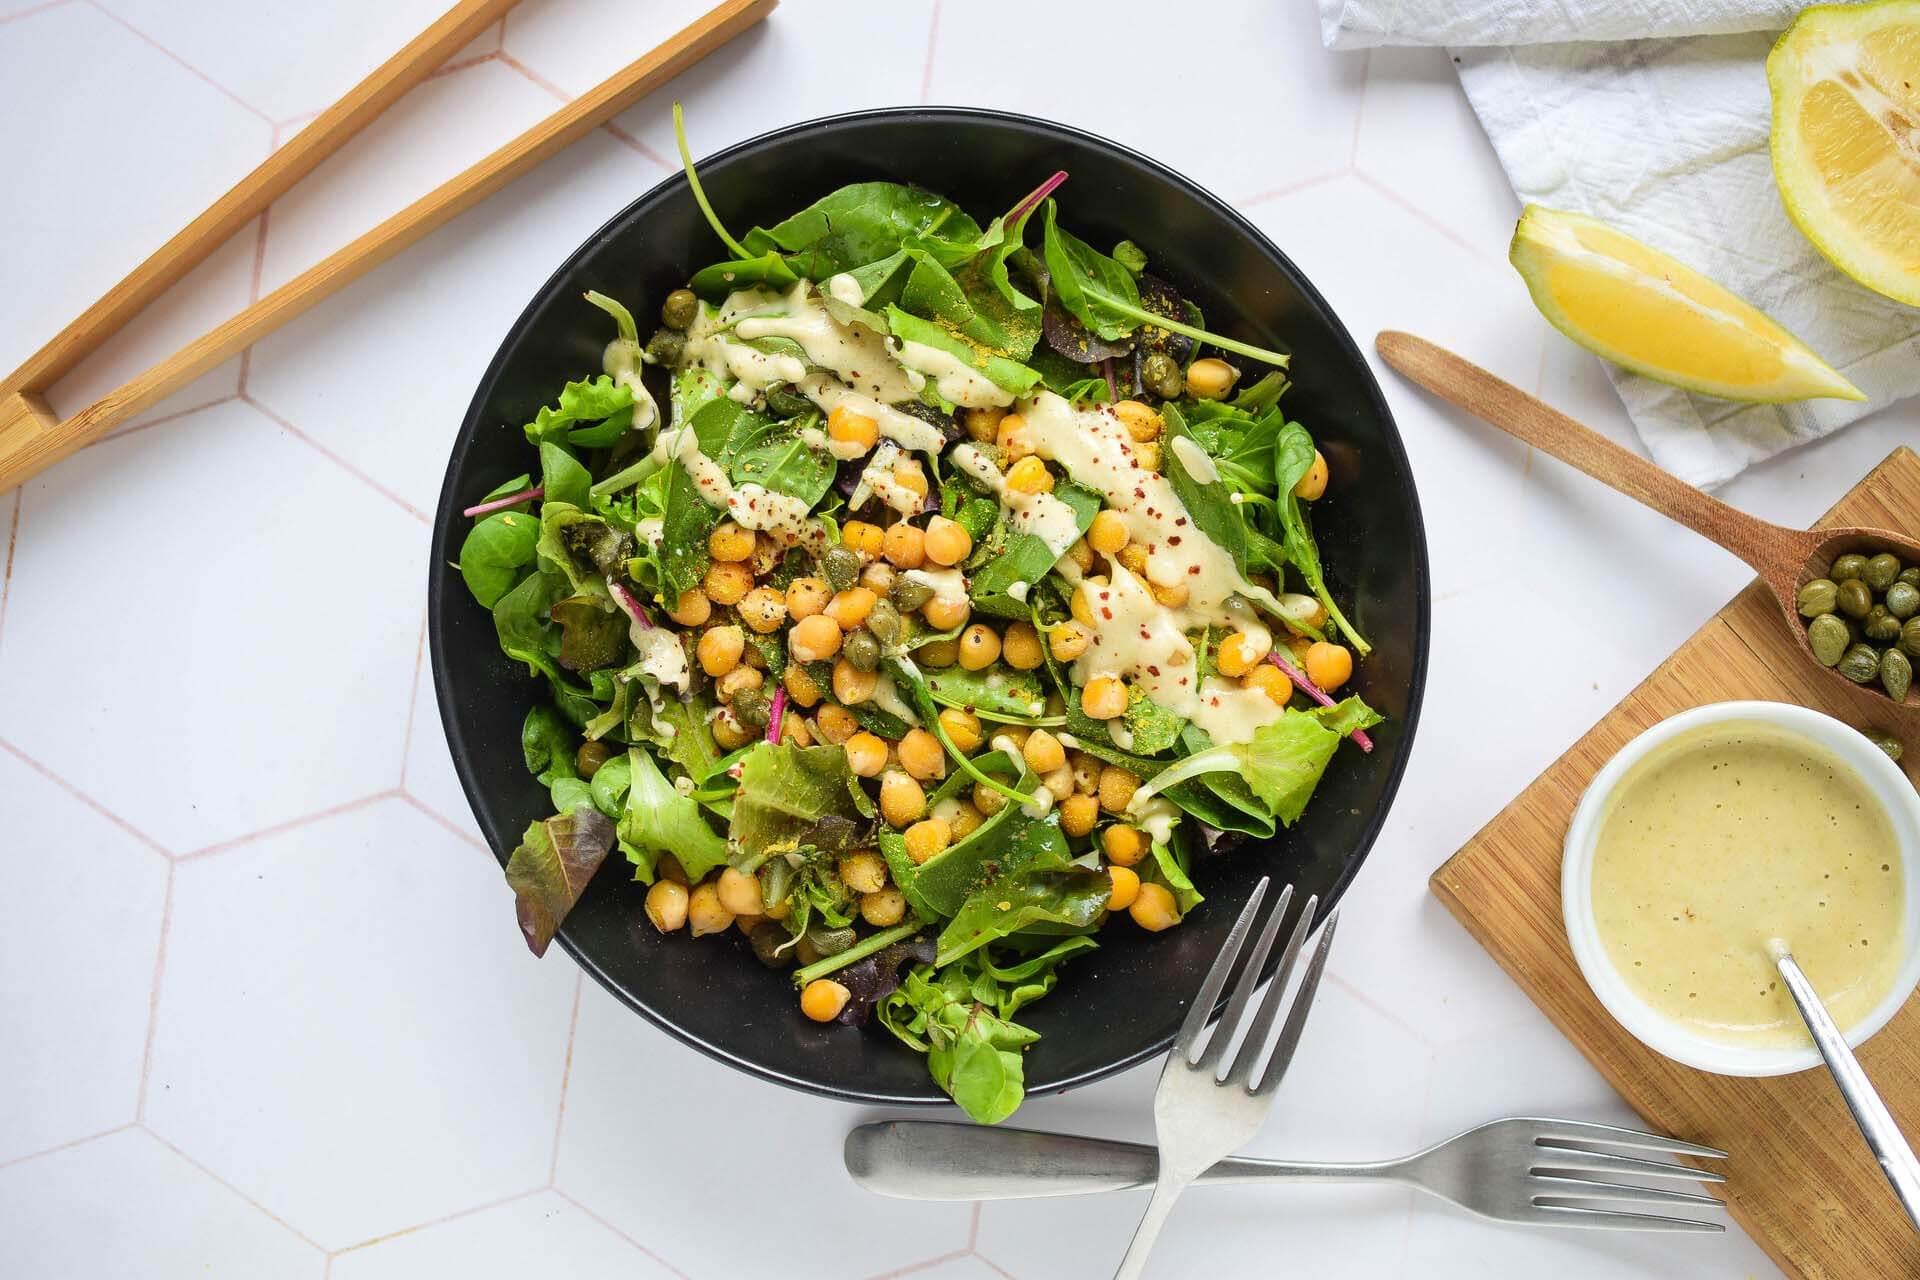 cezar salata, klub zdravih navika, kzn, cezar salata klub zdravih navika, cezar salata kzn, cezar salata sa leblebijama, cezar salata od leblebija, salata od leblebija, hranljiva salata, zdravi recepti, slano, obrok salata, rucak, Iceberg Salat Centar